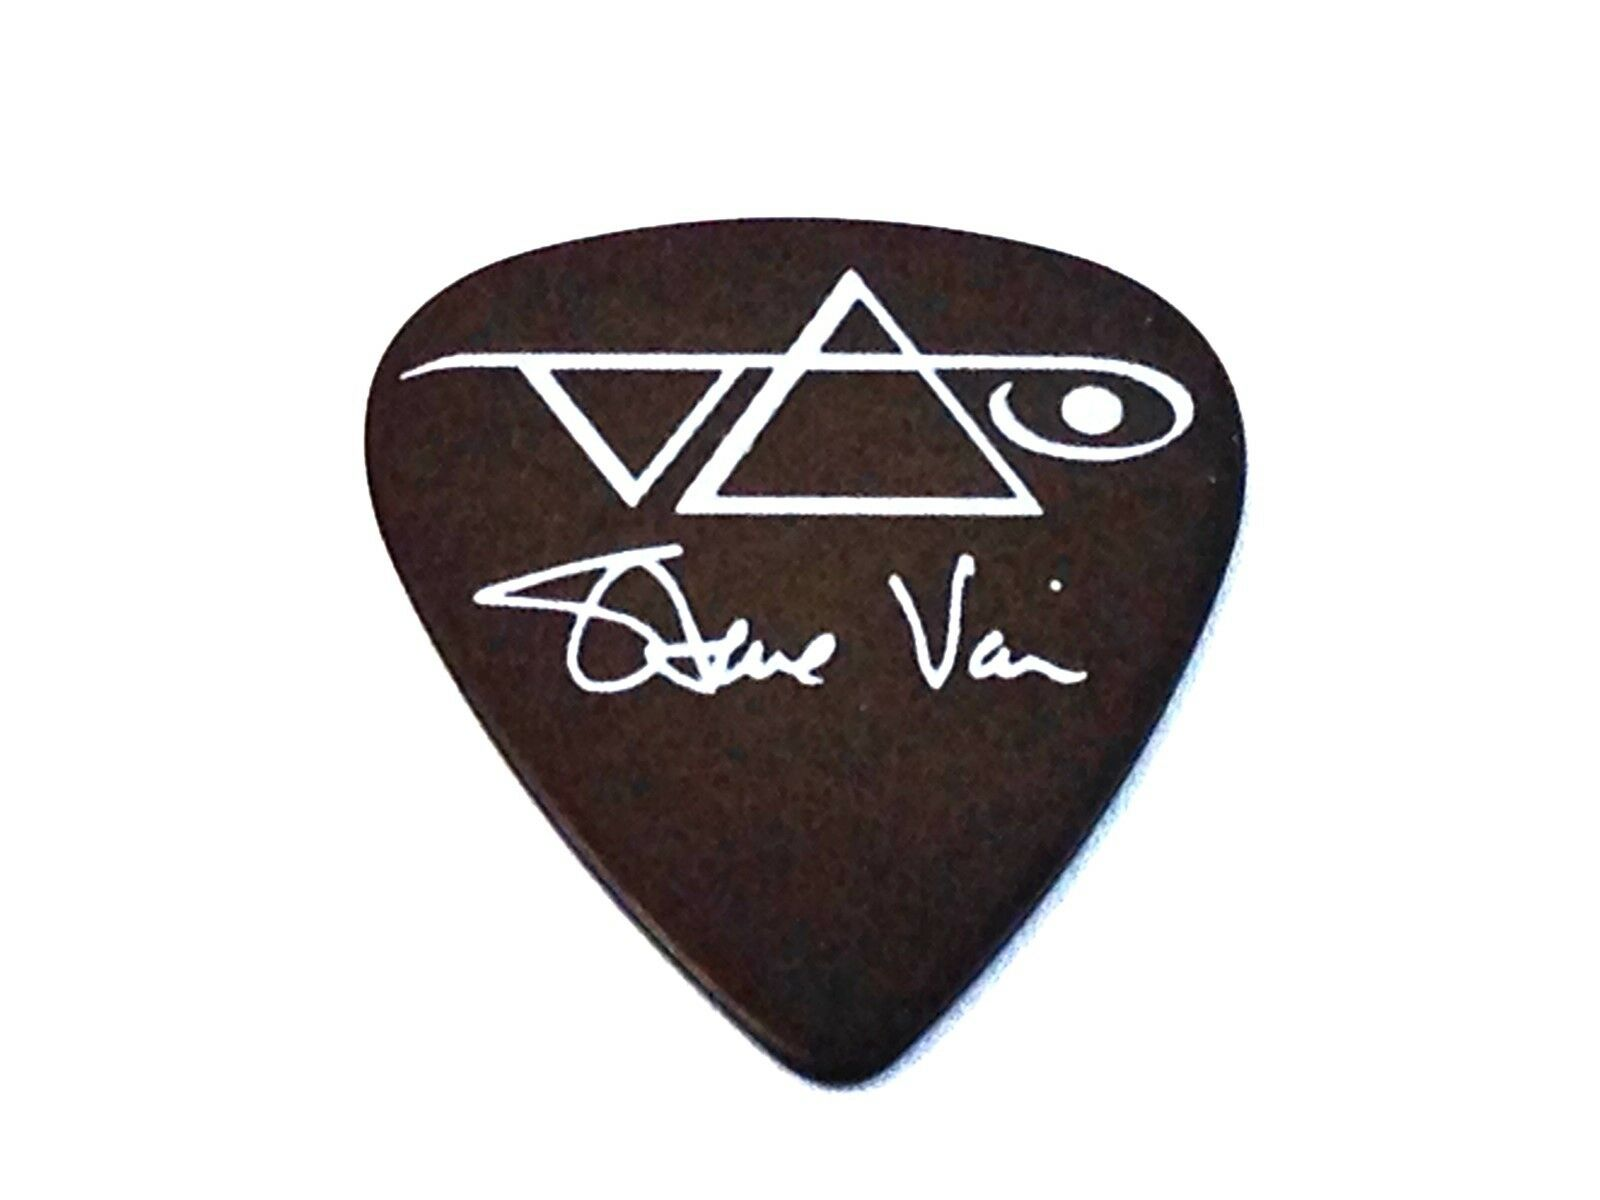 Ibanez Steve Vai Signature Picks 6-Pack Brown